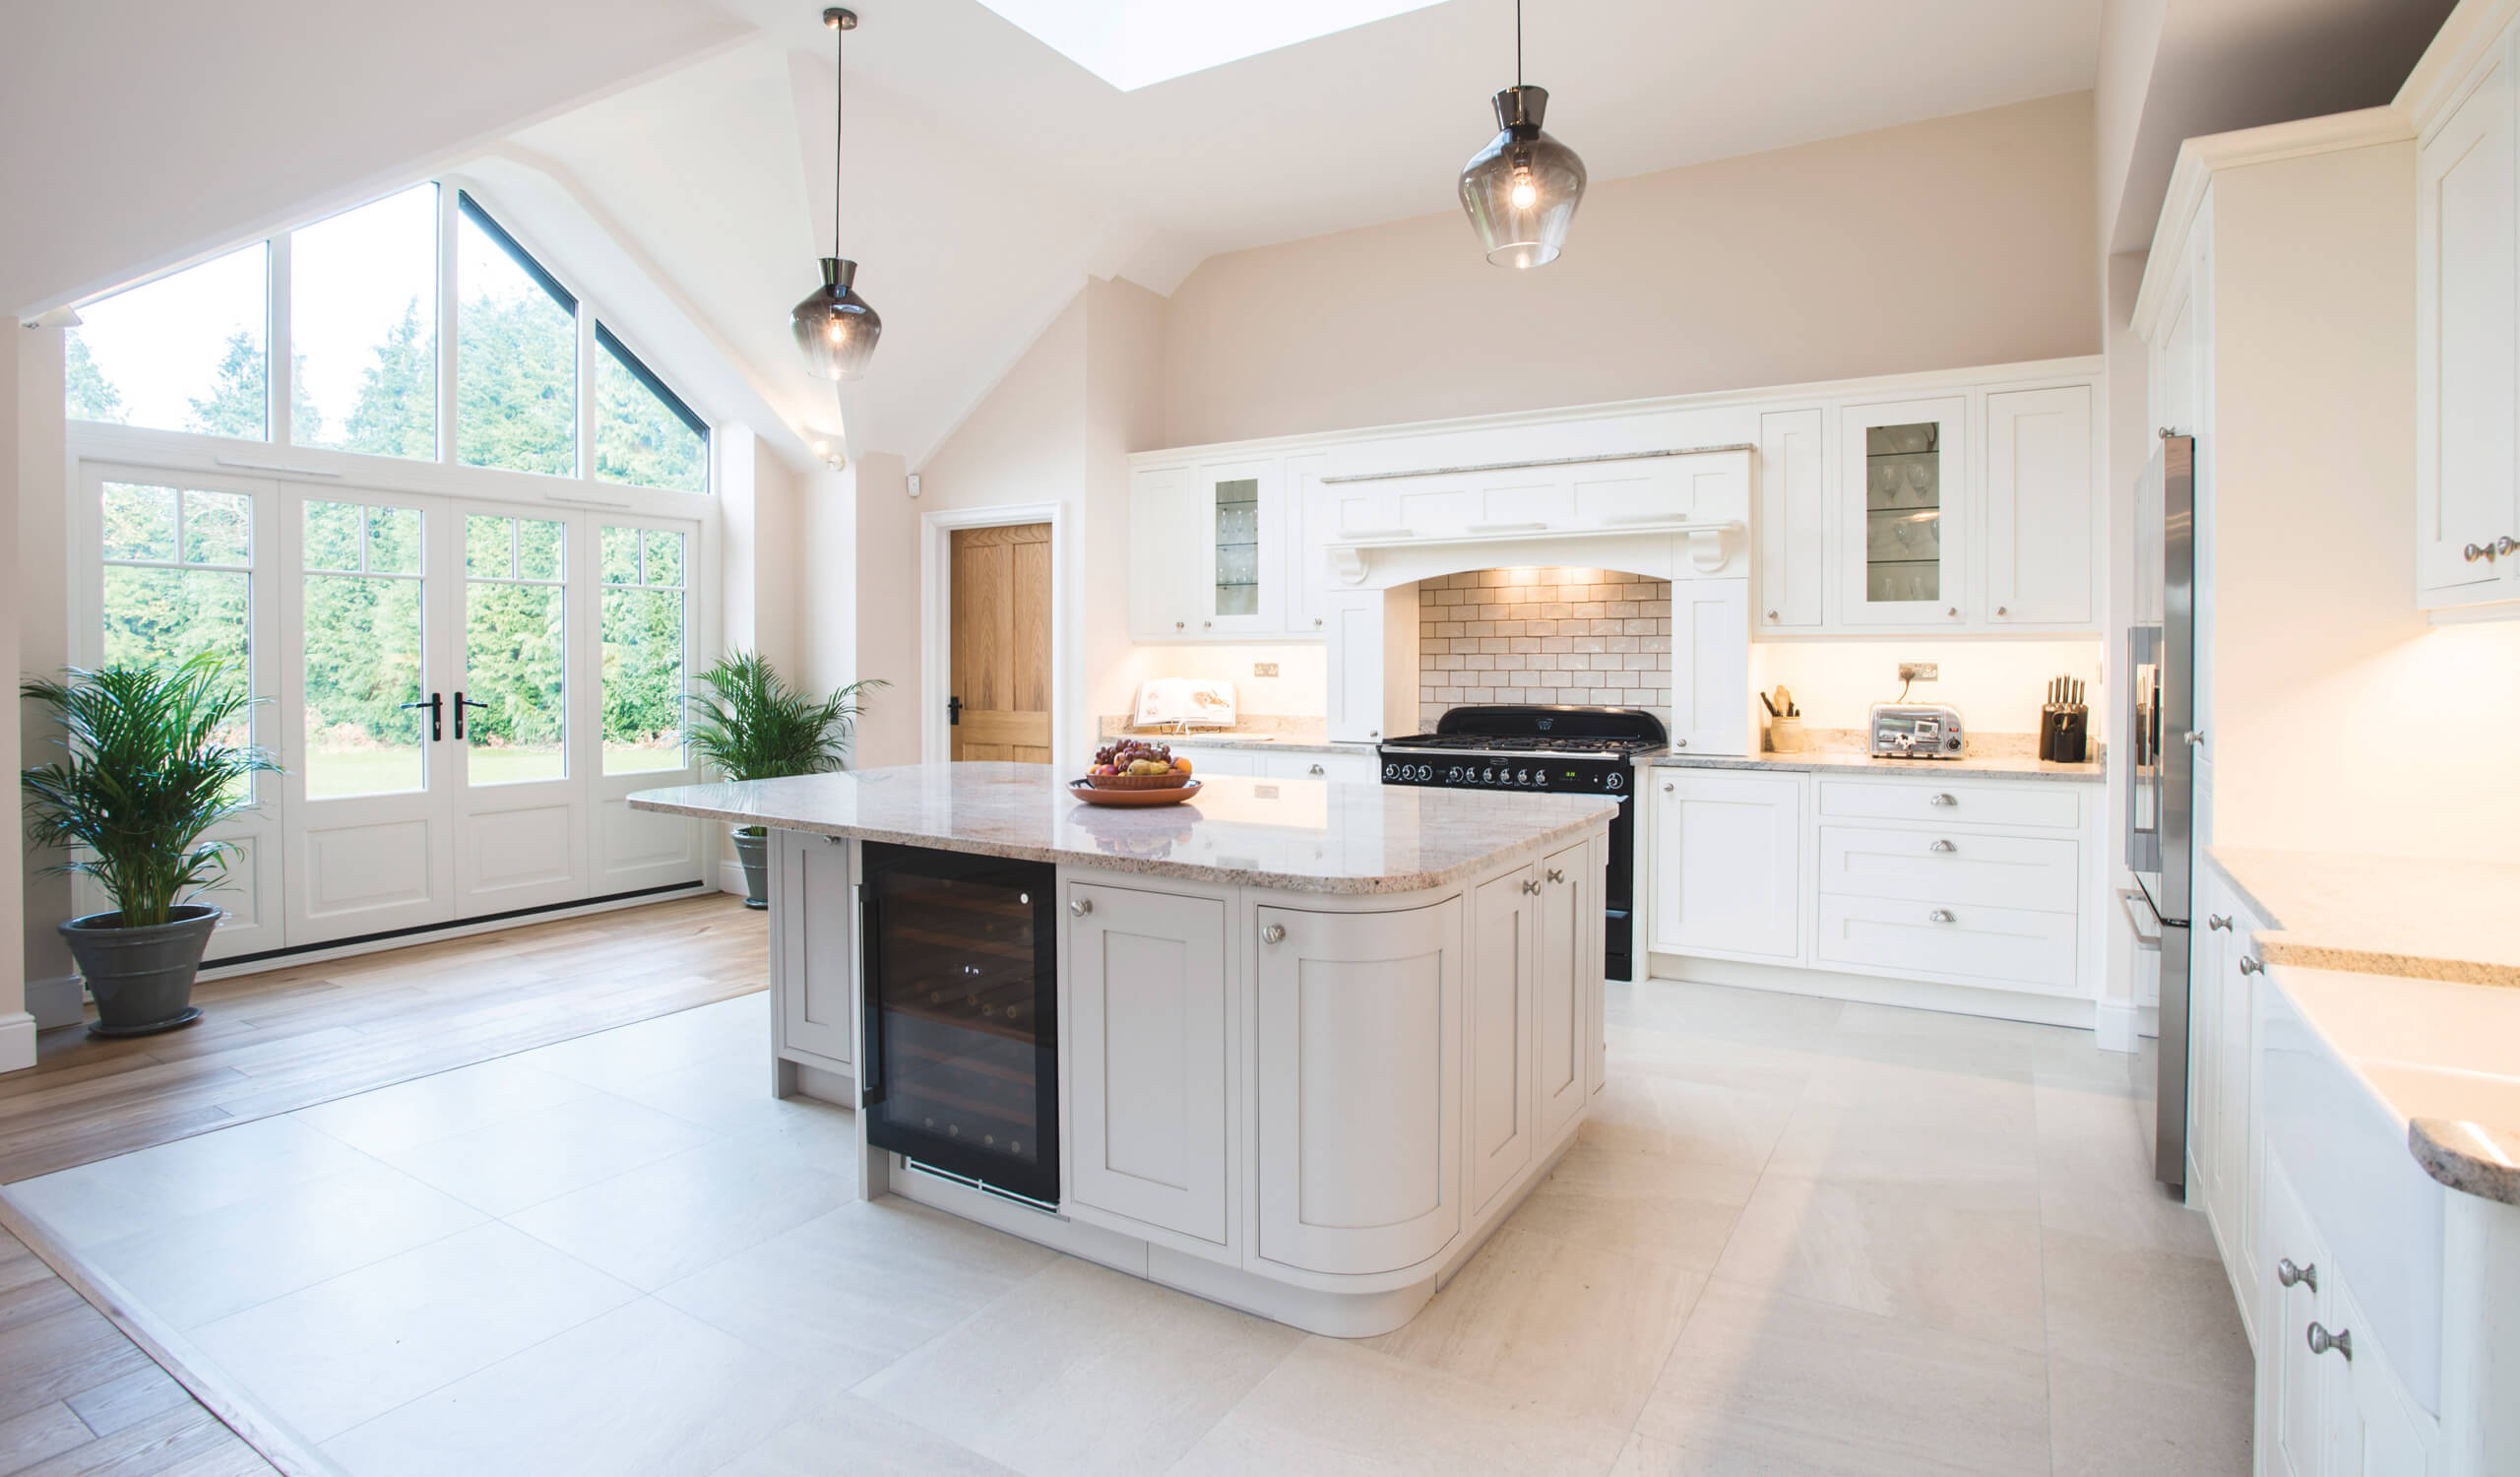 shaker-style kitchen